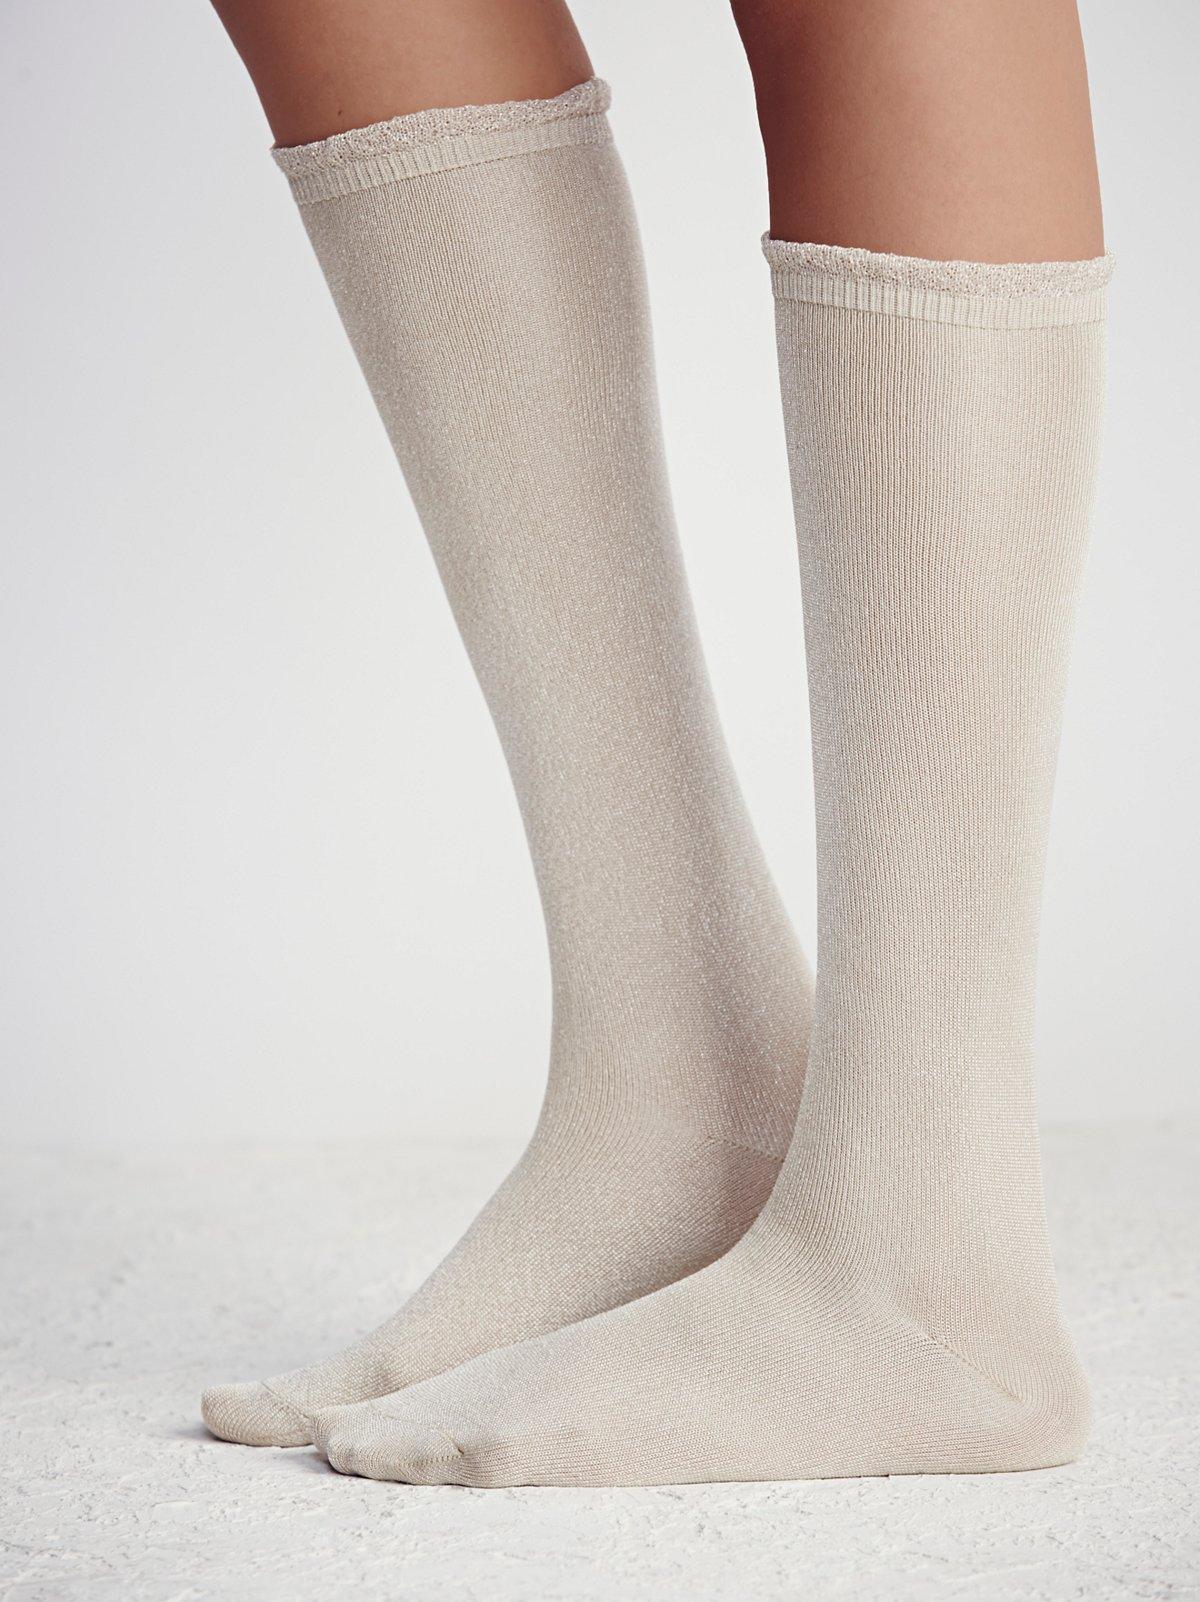 Star Crossed及膝袜